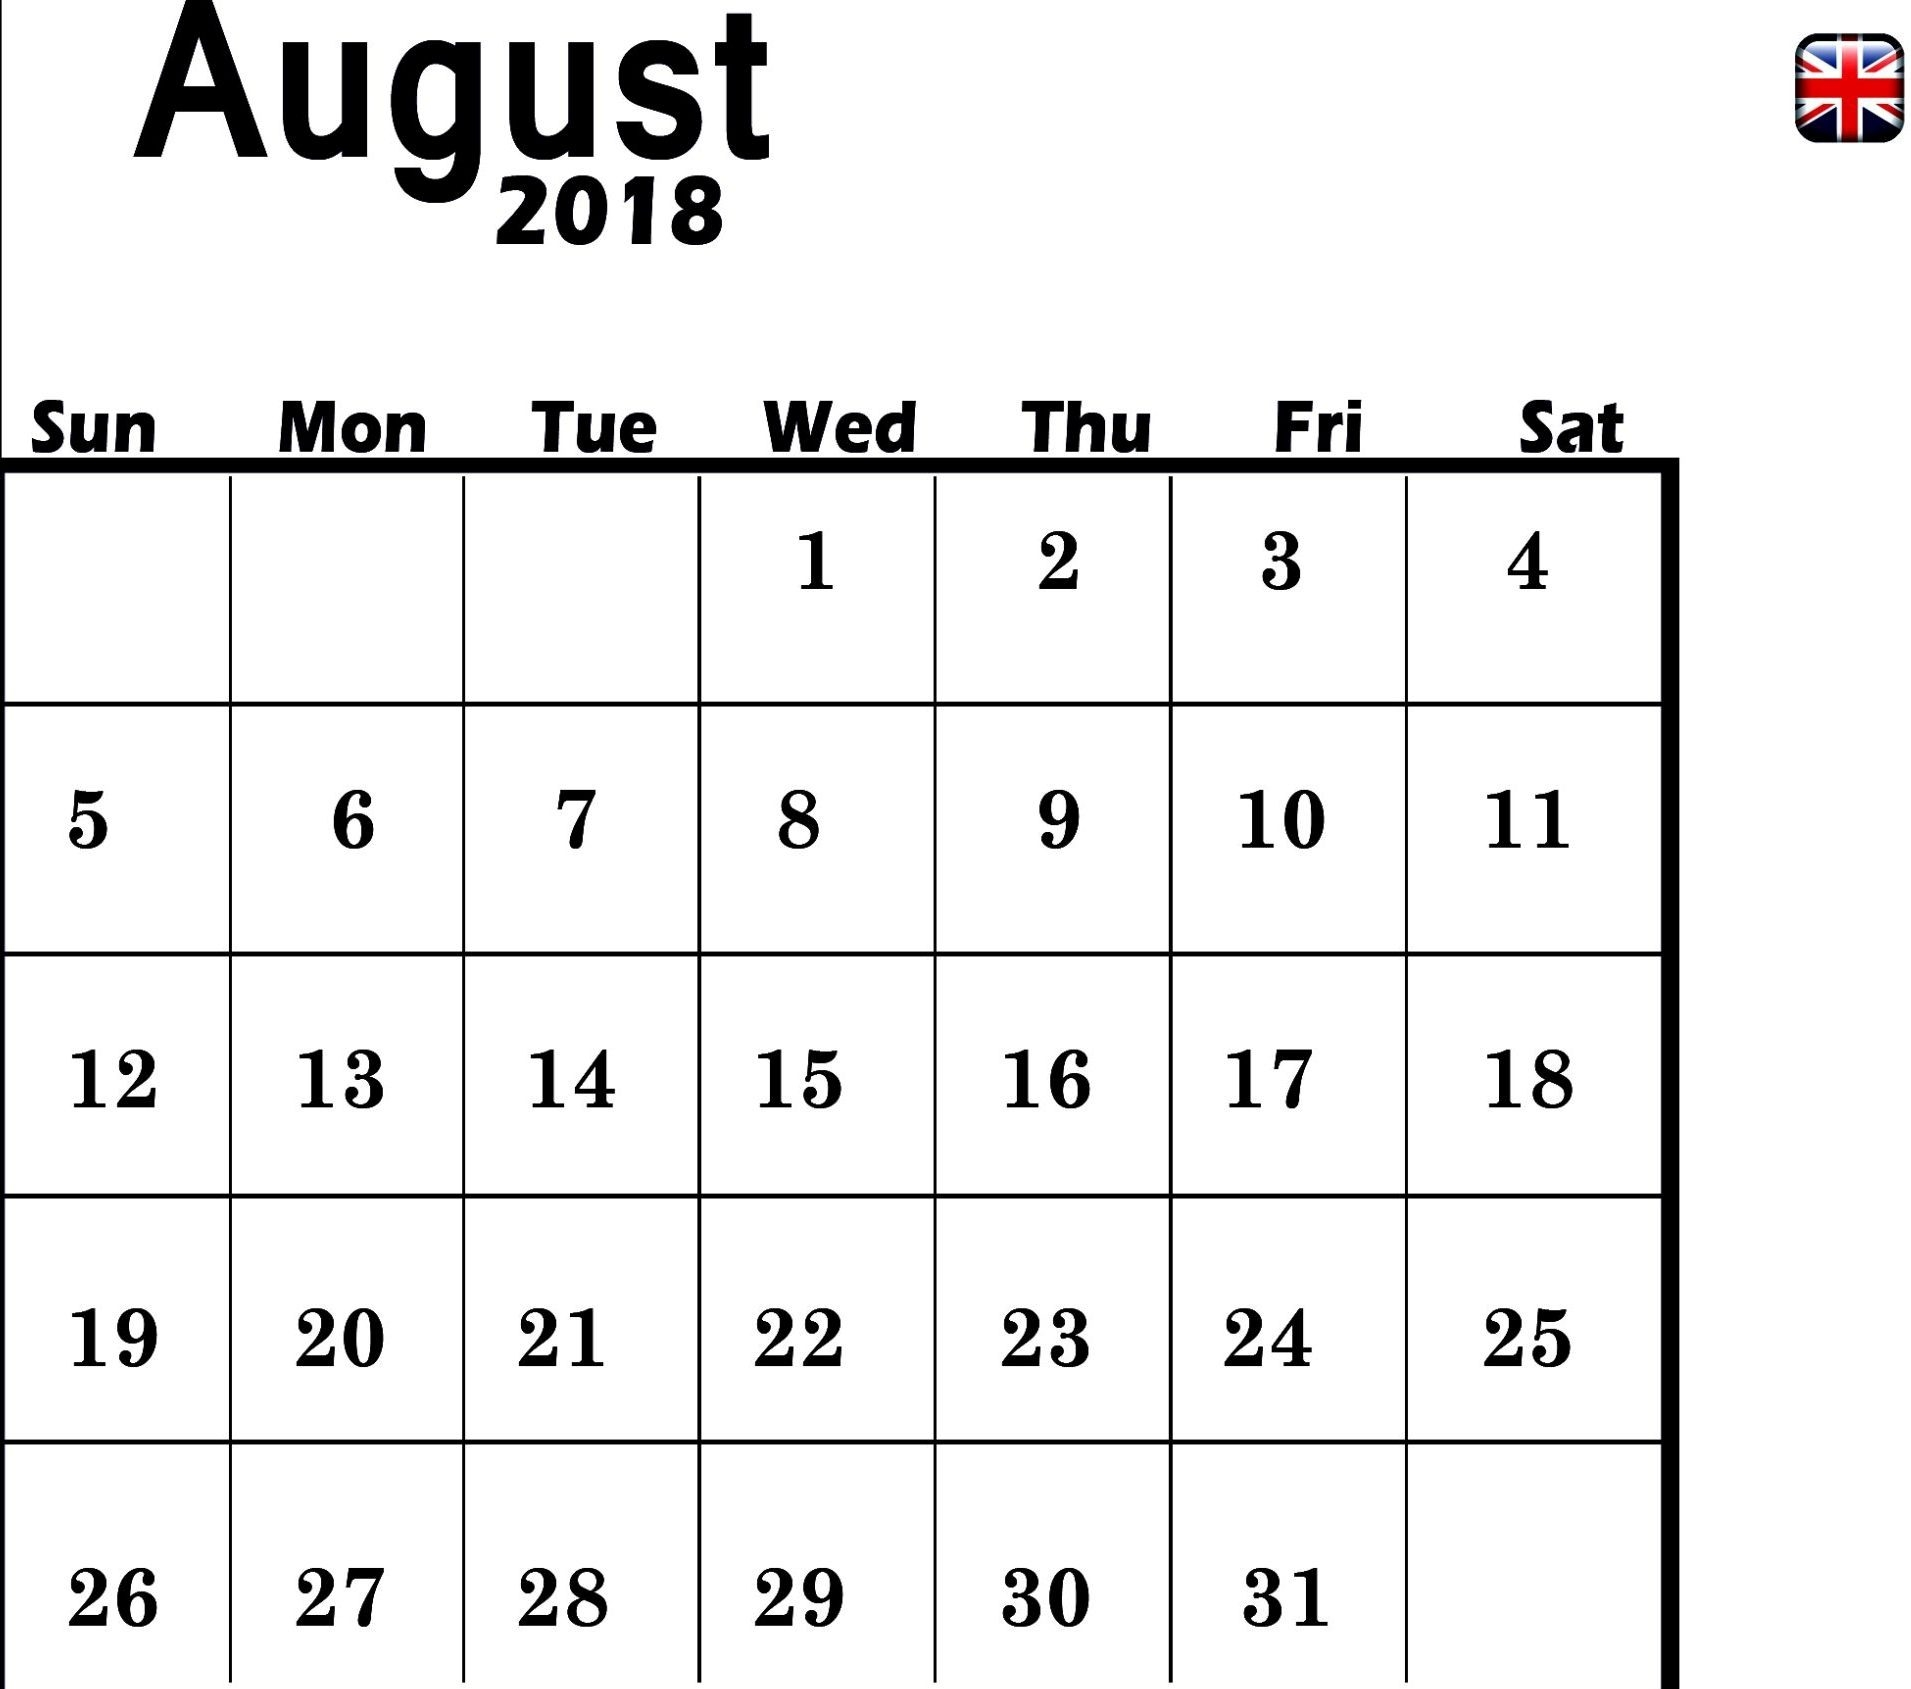 august 2018 calendar for uk printable calendar 2018 template excel Calendar August 2018 Printable Uk erdferdf